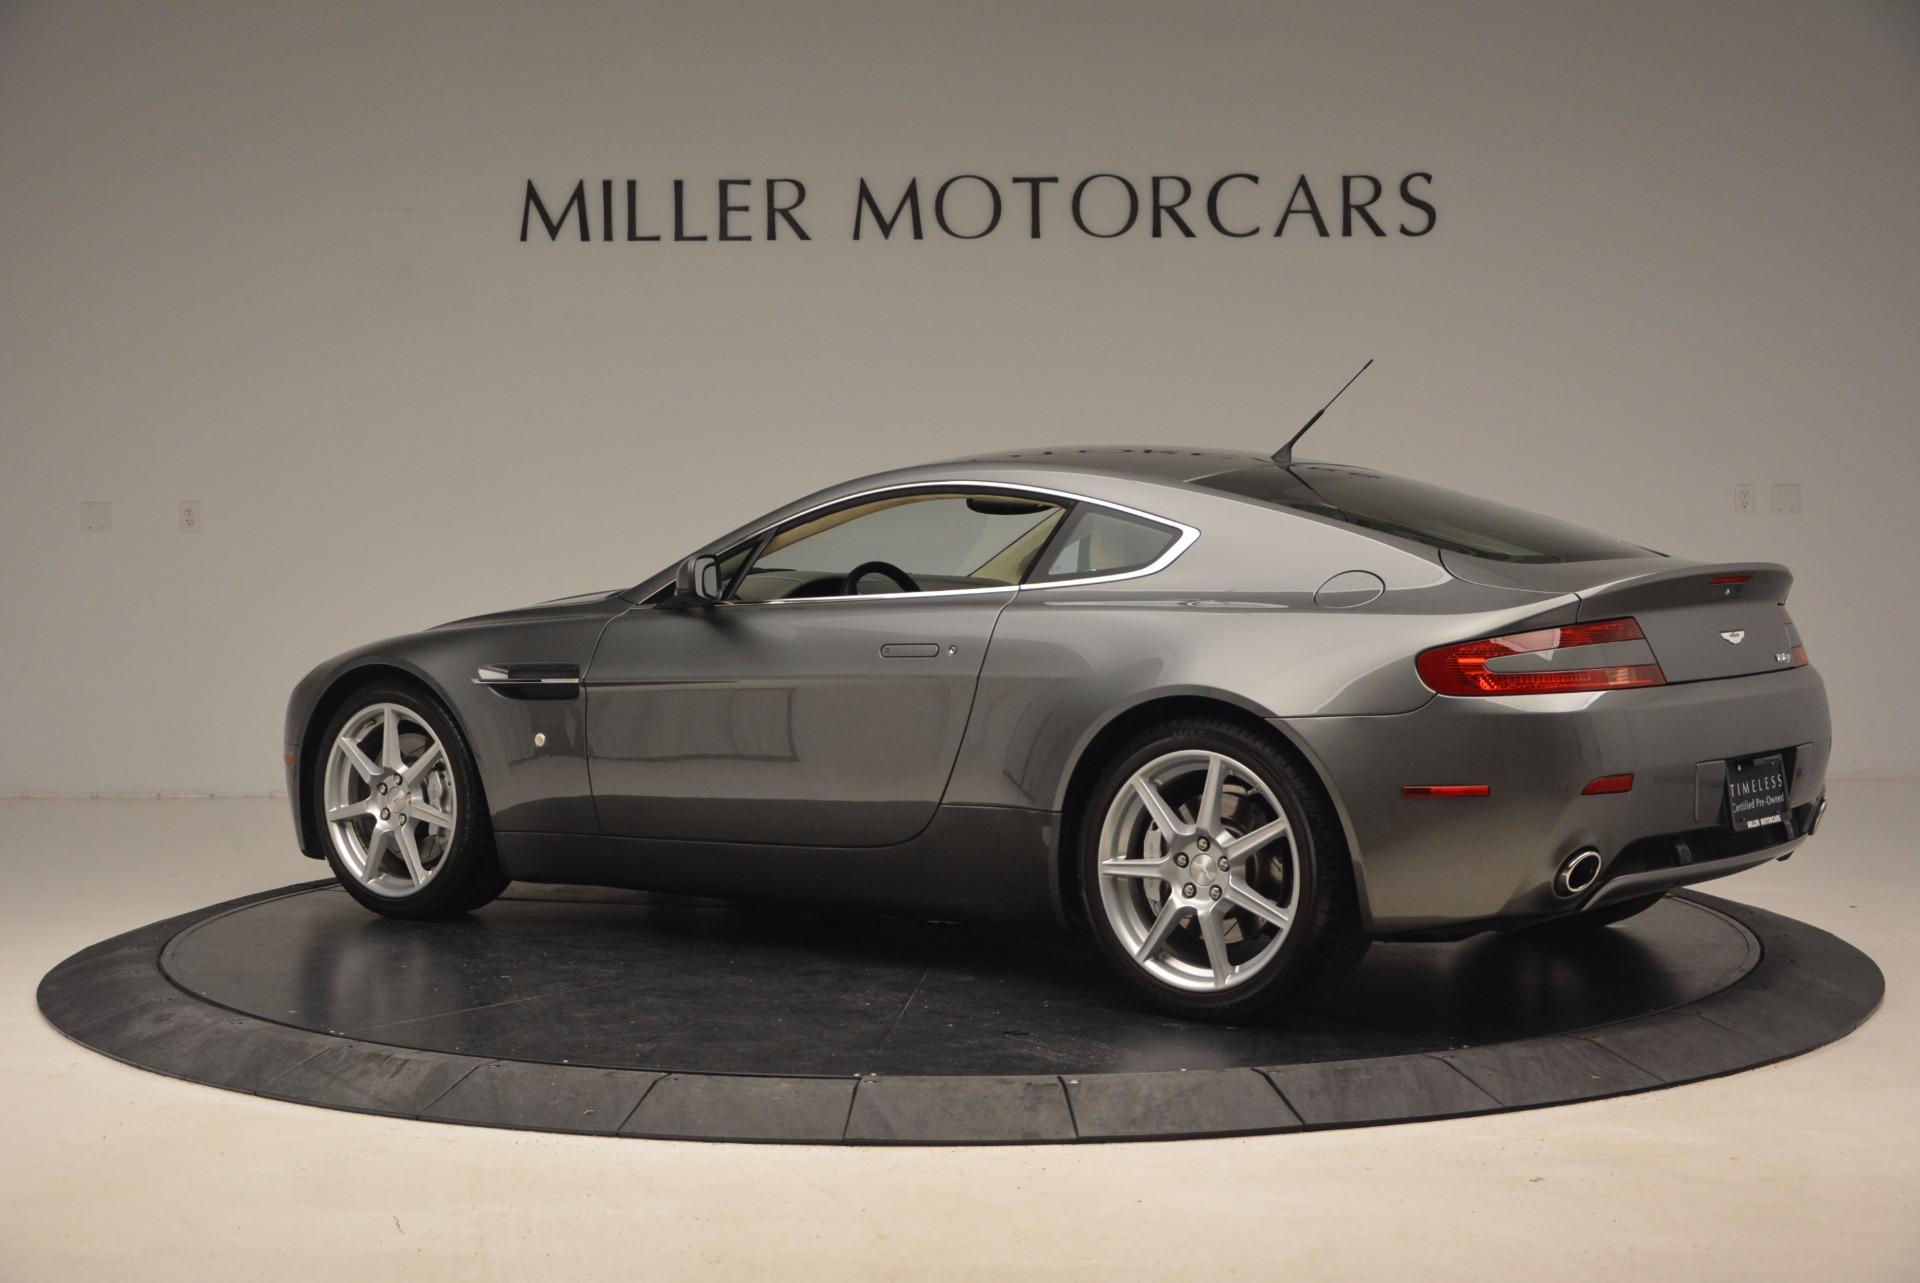 Used 2006 Aston Martin V8 Vantage  For Sale In Greenwich, CT 1658_p4